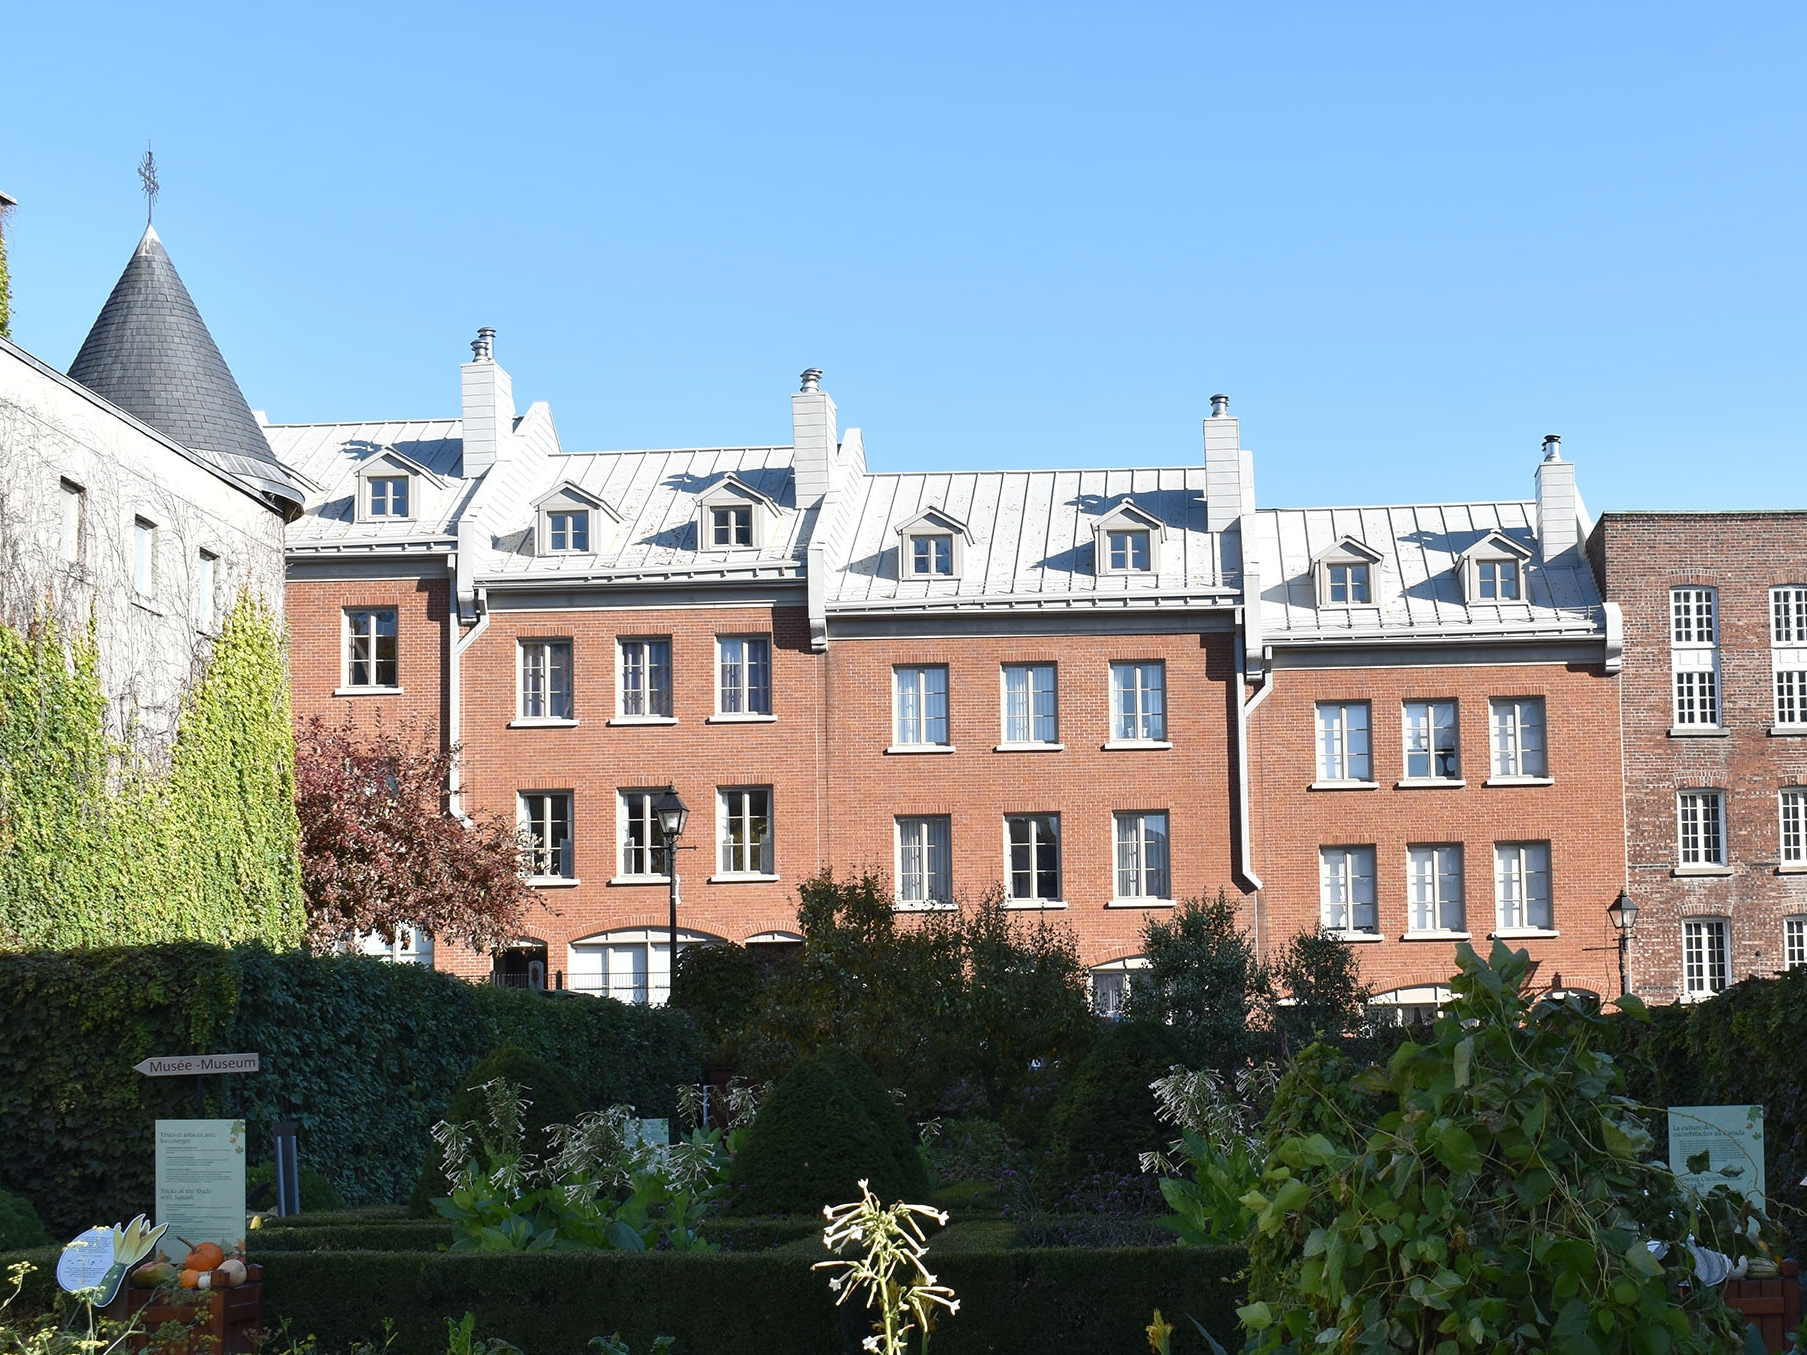 Jardins_chateauramzay_0288 copy.jpg